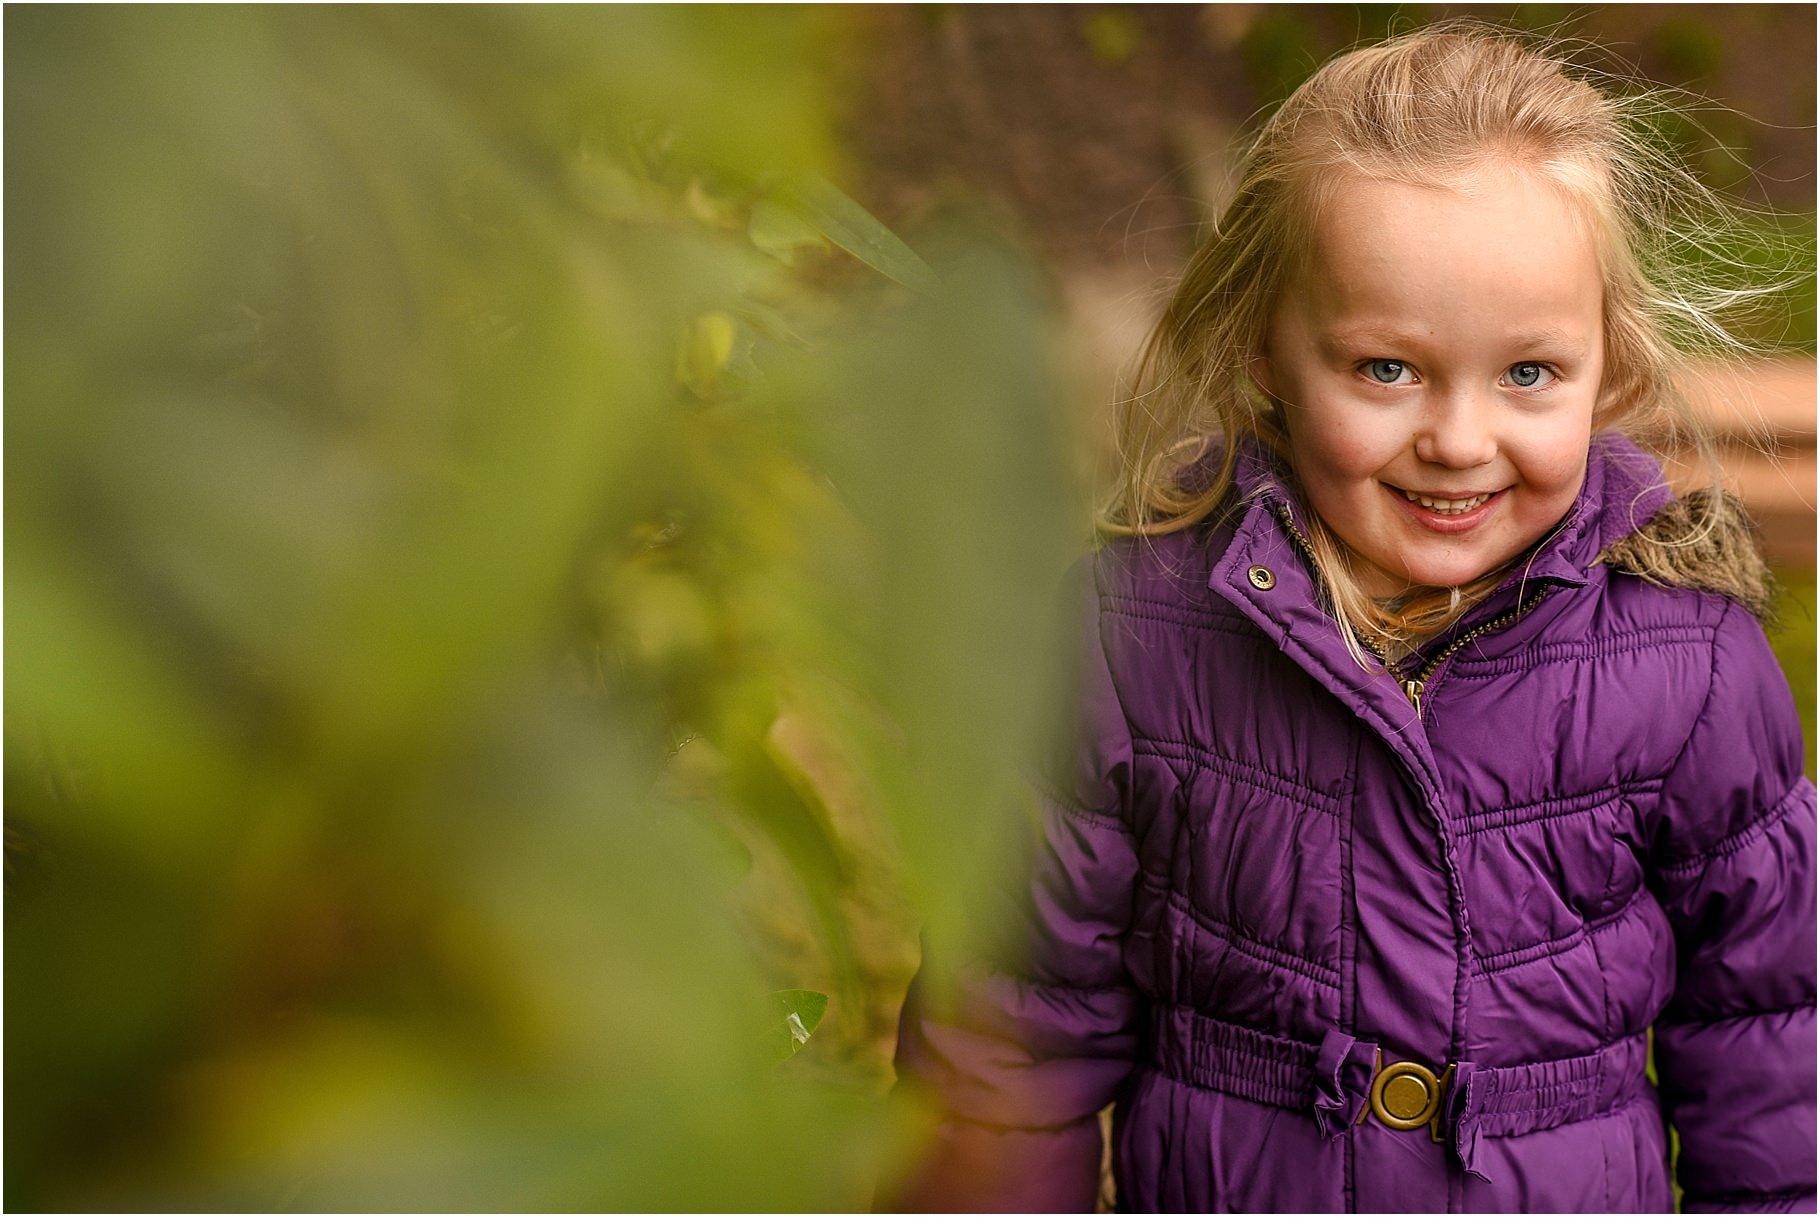 lancashire-family-portraits-documentary-newborn-32.jpg